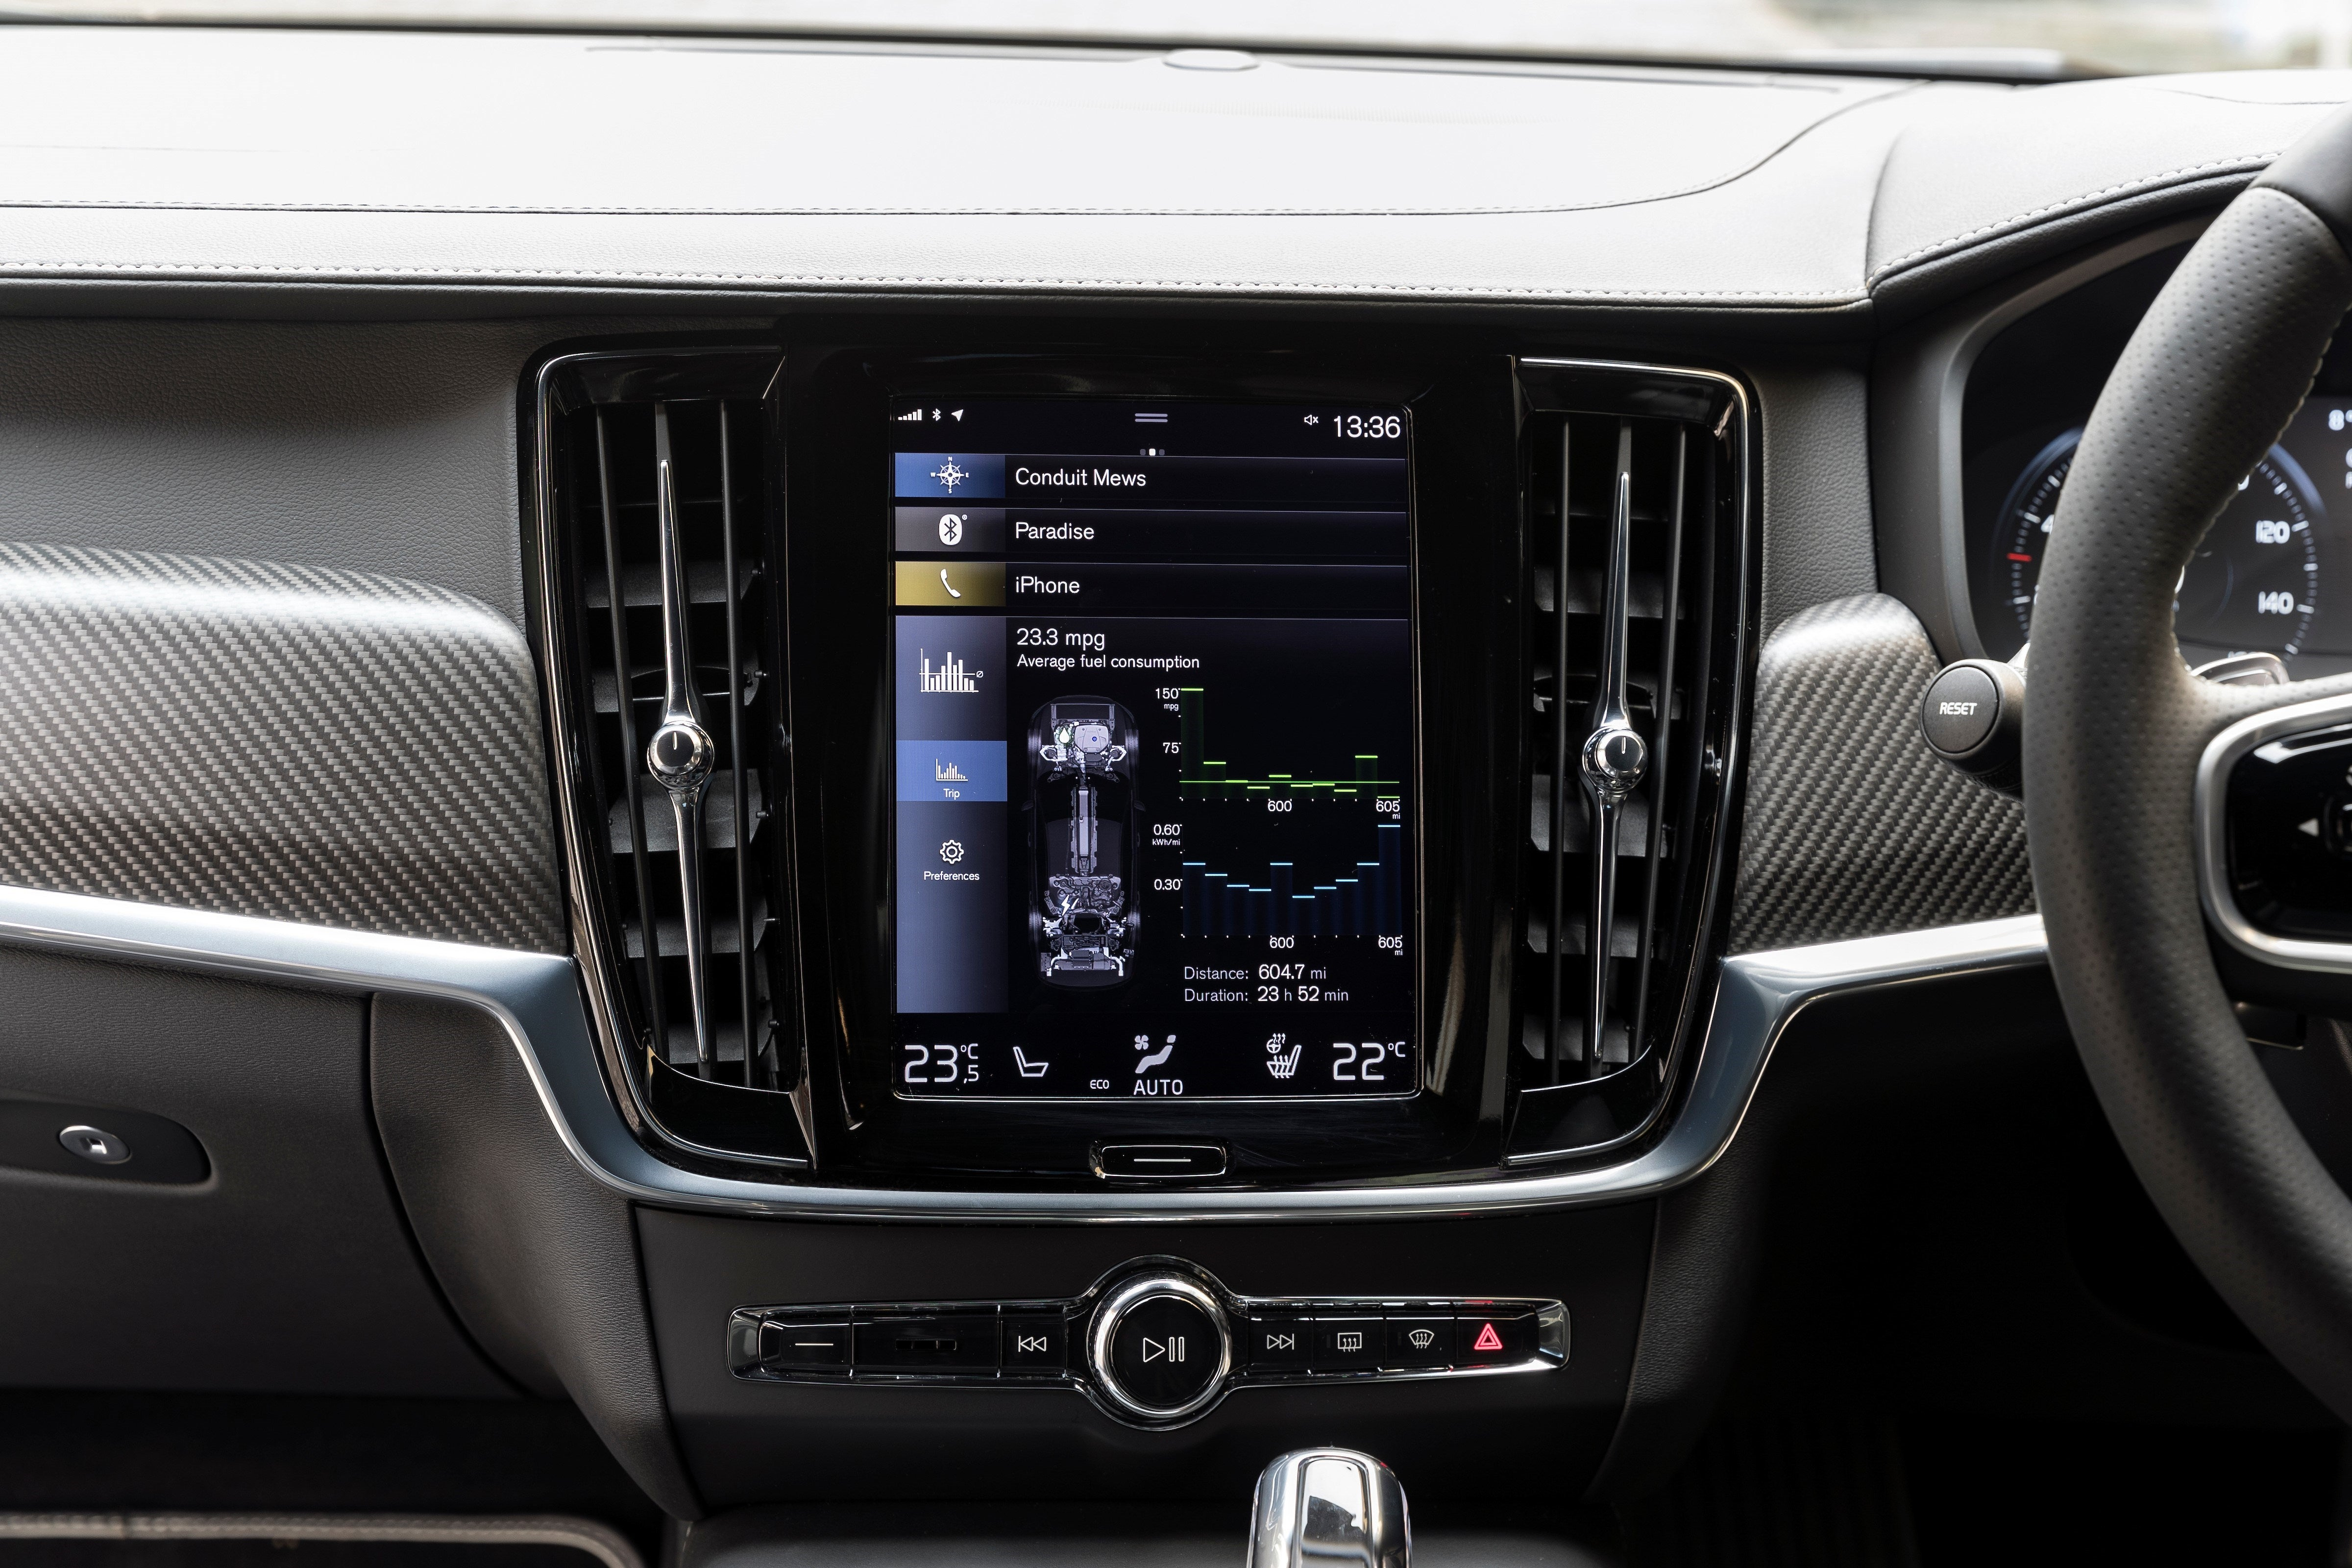 Volvo S90 Electric Infotainment